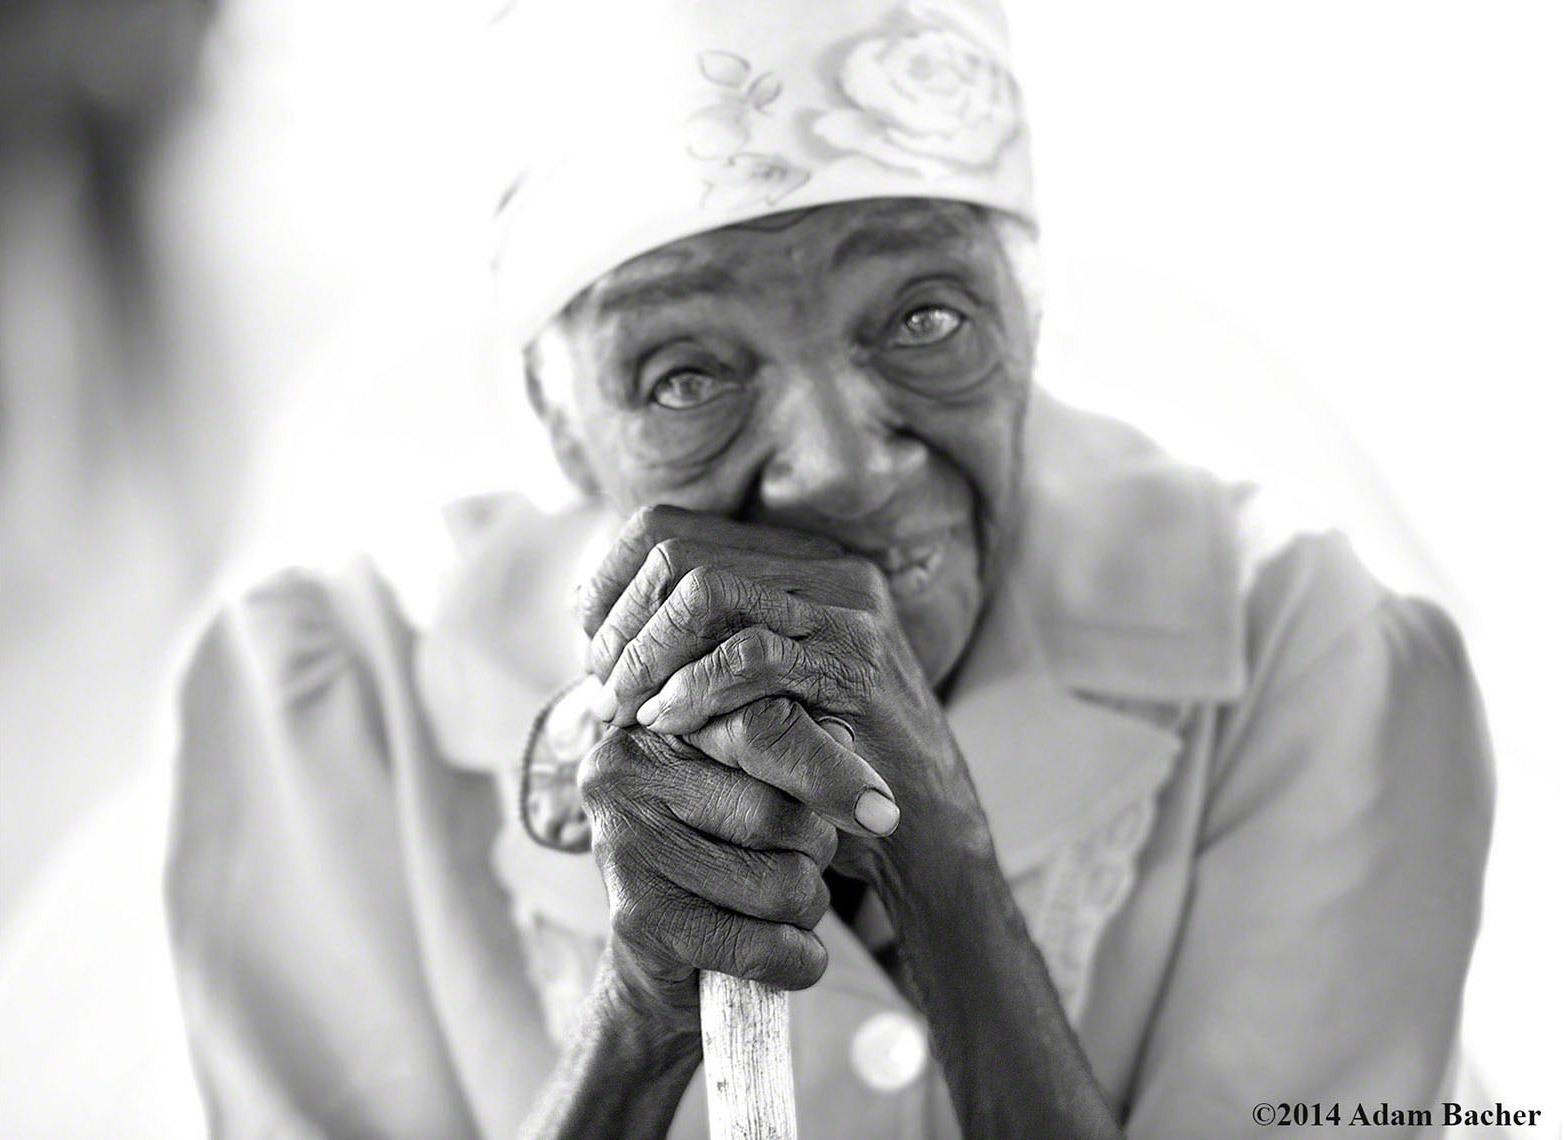 Dondon, Mobile Healthcare Clinic, Haitian Caribbean American Organization of Texas, HACAOT, Haiti, 11-09-2011